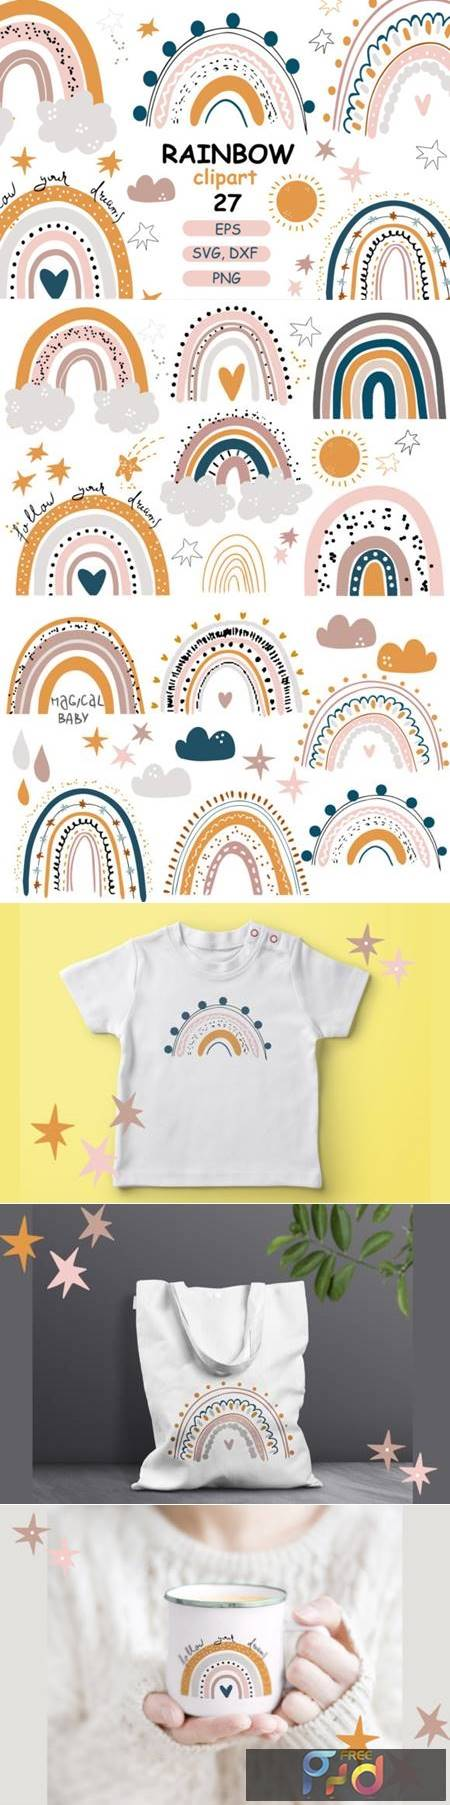 Rainbow Baby Pastel Clipart 4328330 1